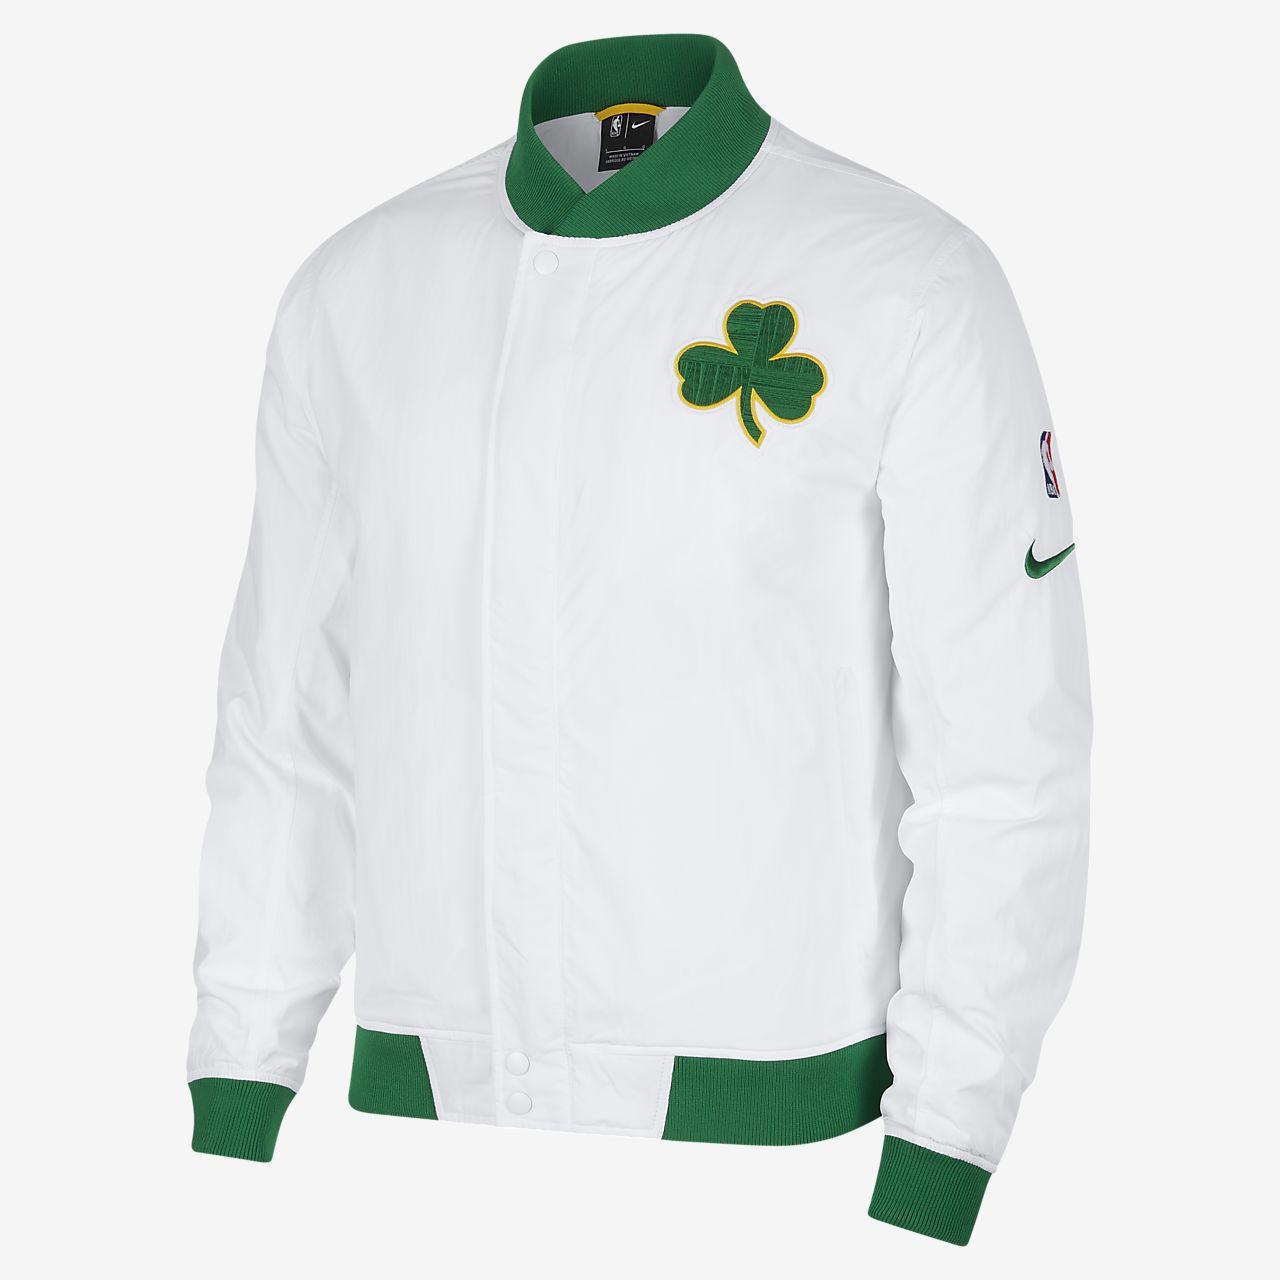 best website 83c75 b693c Boston Celtics Nike Courtside Men's NBA Jacket